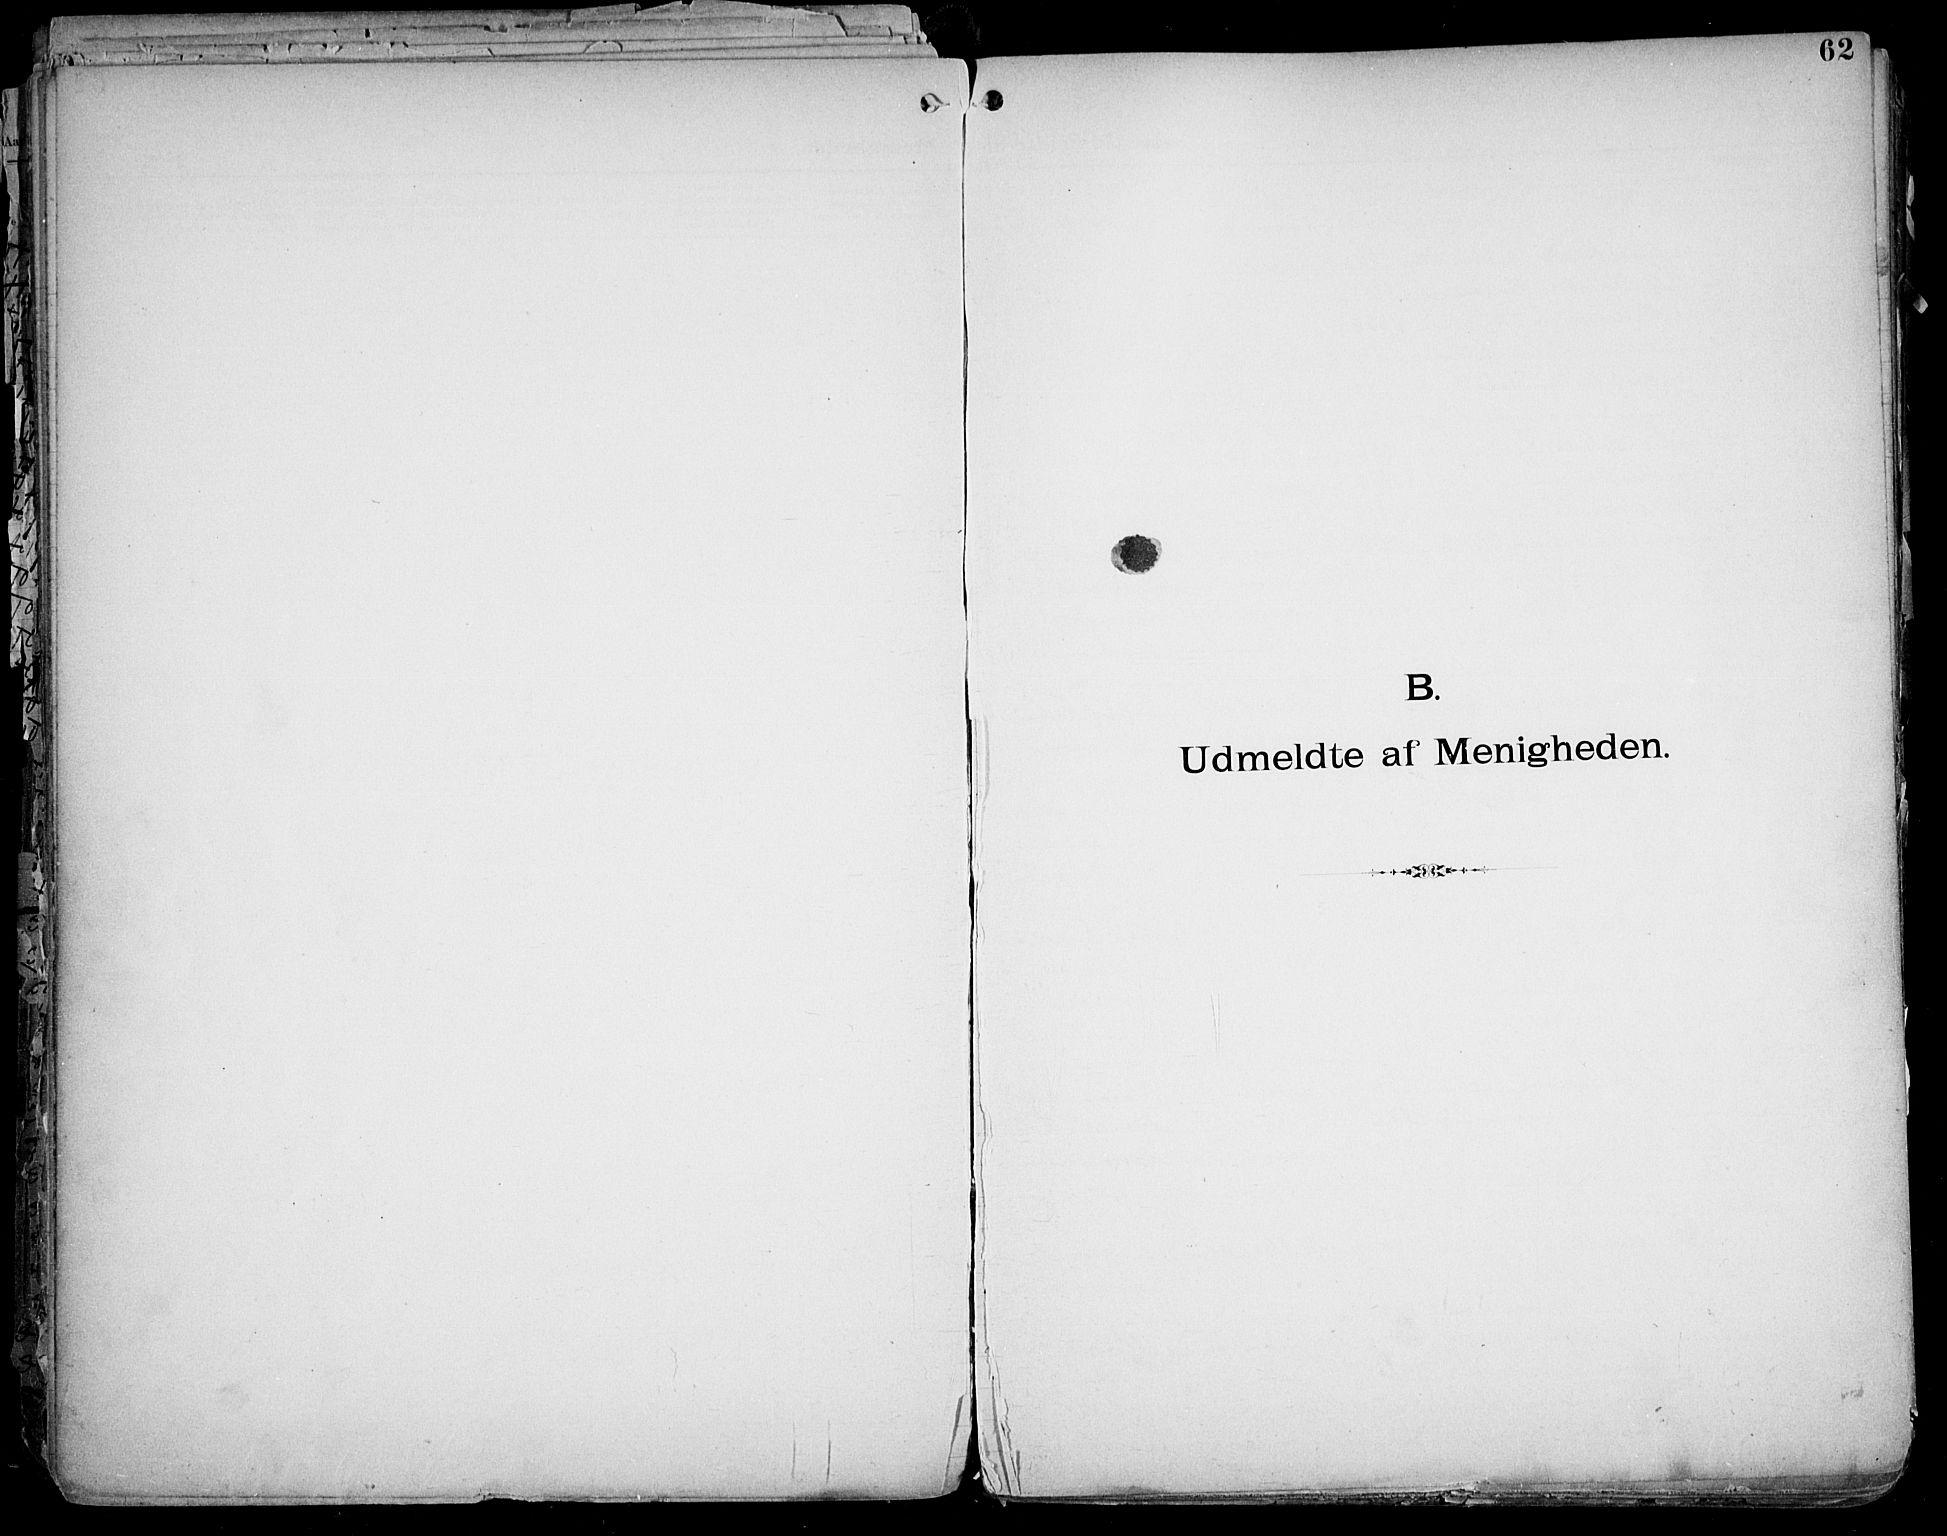 SAO, Første Metodistkirke Oslo -  menighetsprotokoller, F/L0004: Dissenterprotokoll nr. 4, 1892-1927, s. 62